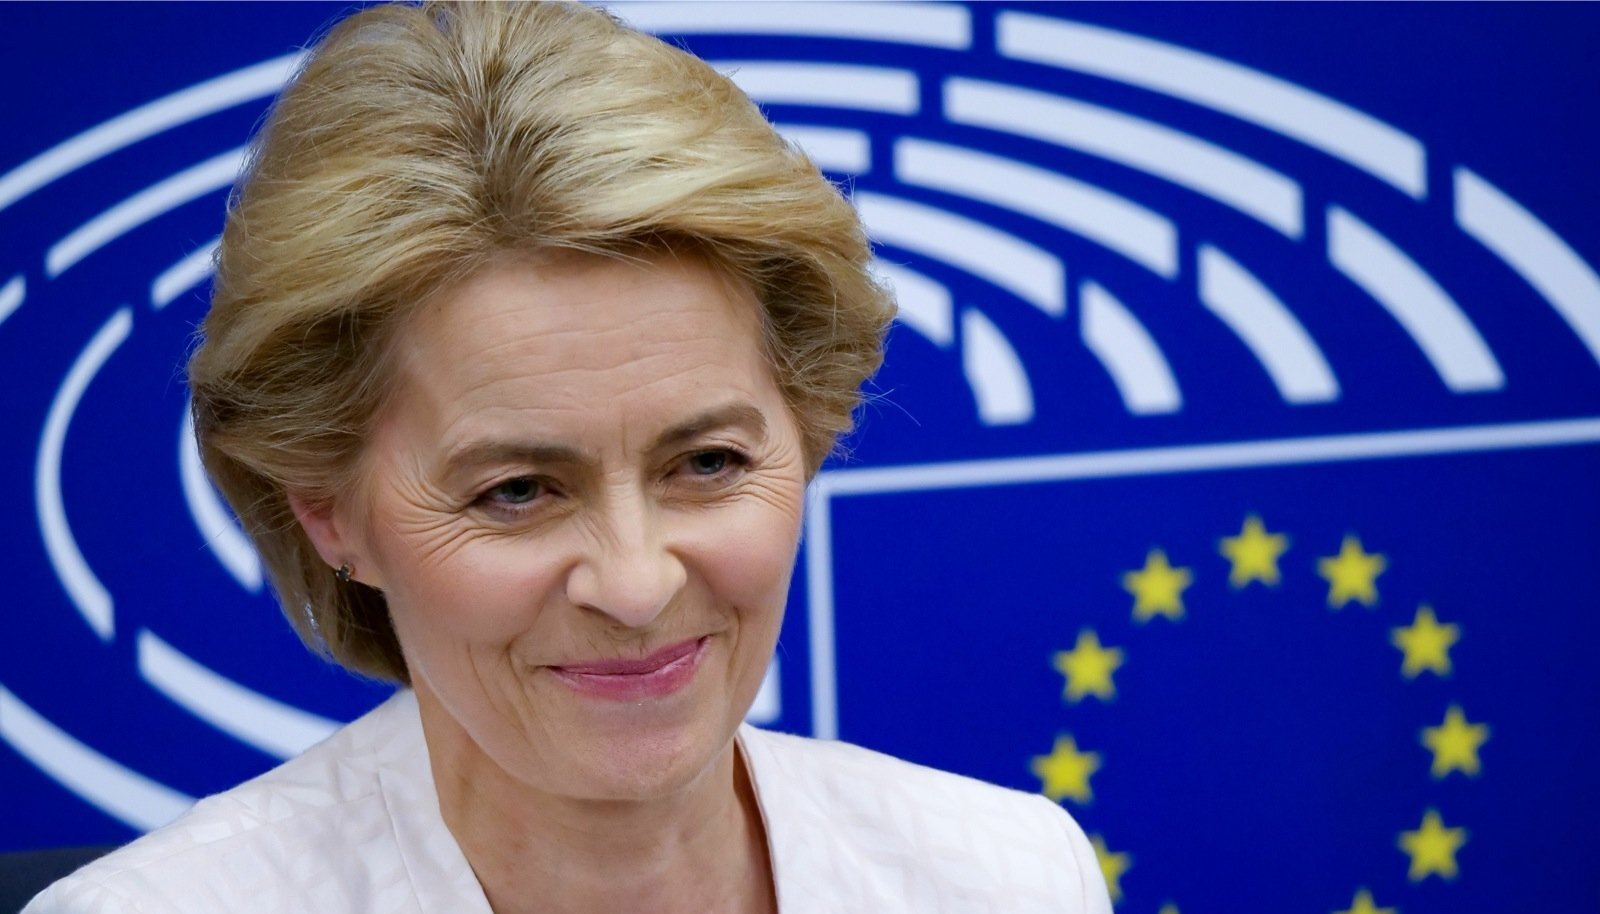 Von der Leyen pärast teisipäevast nappi võitu europarlamendis